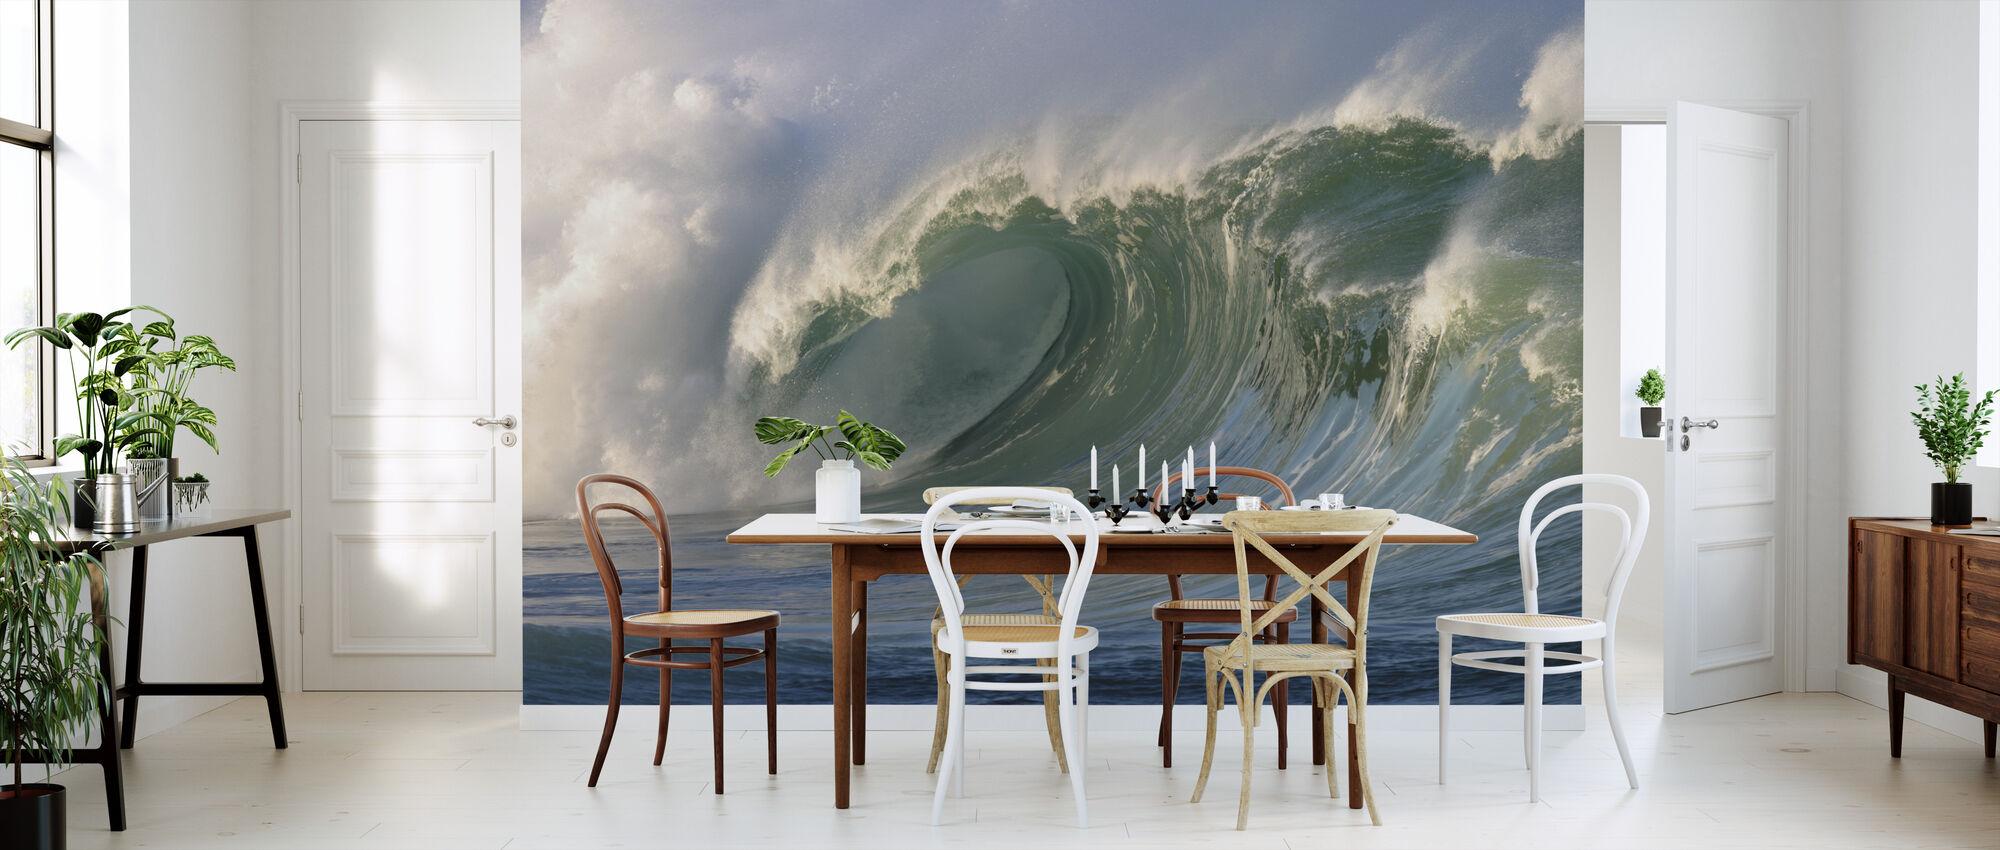 Wave breaking at Waimea Bay - Wallpaper - Kitchen